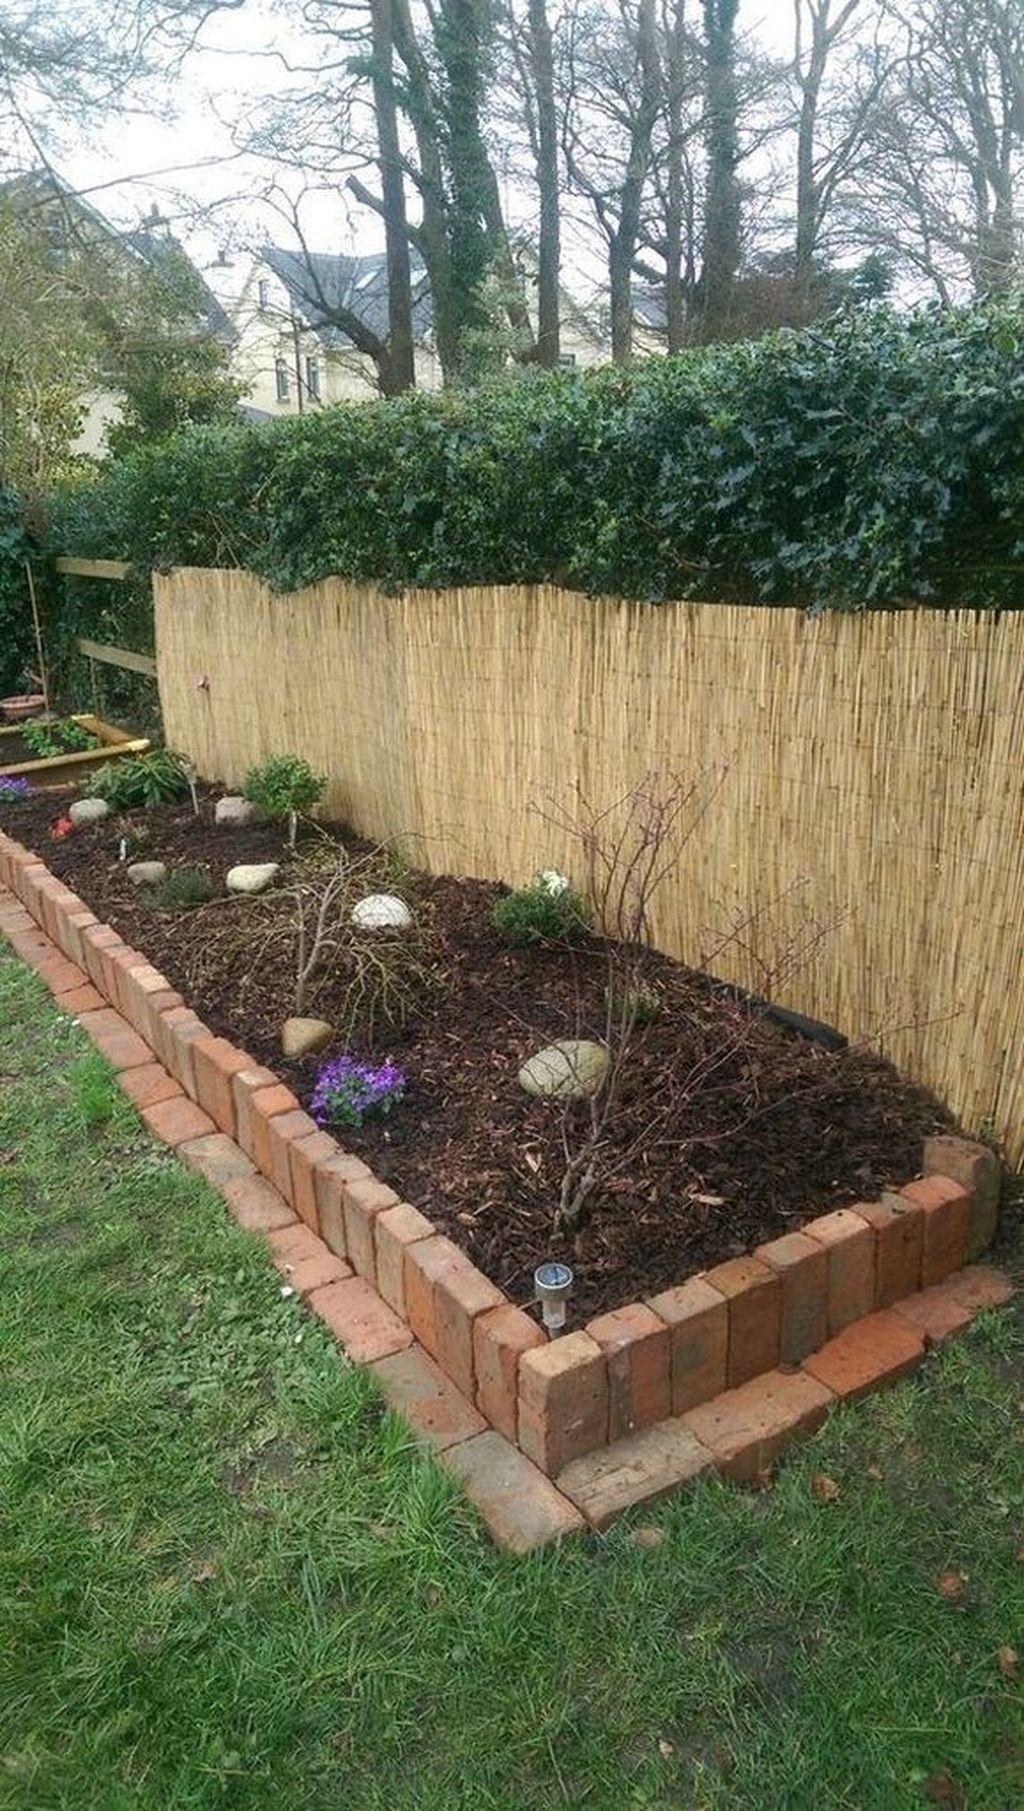 20 Marvelous Garden Border Ideas To Dress Up Your Landscape Edging Brick Garden Easy Garden Beds Brick